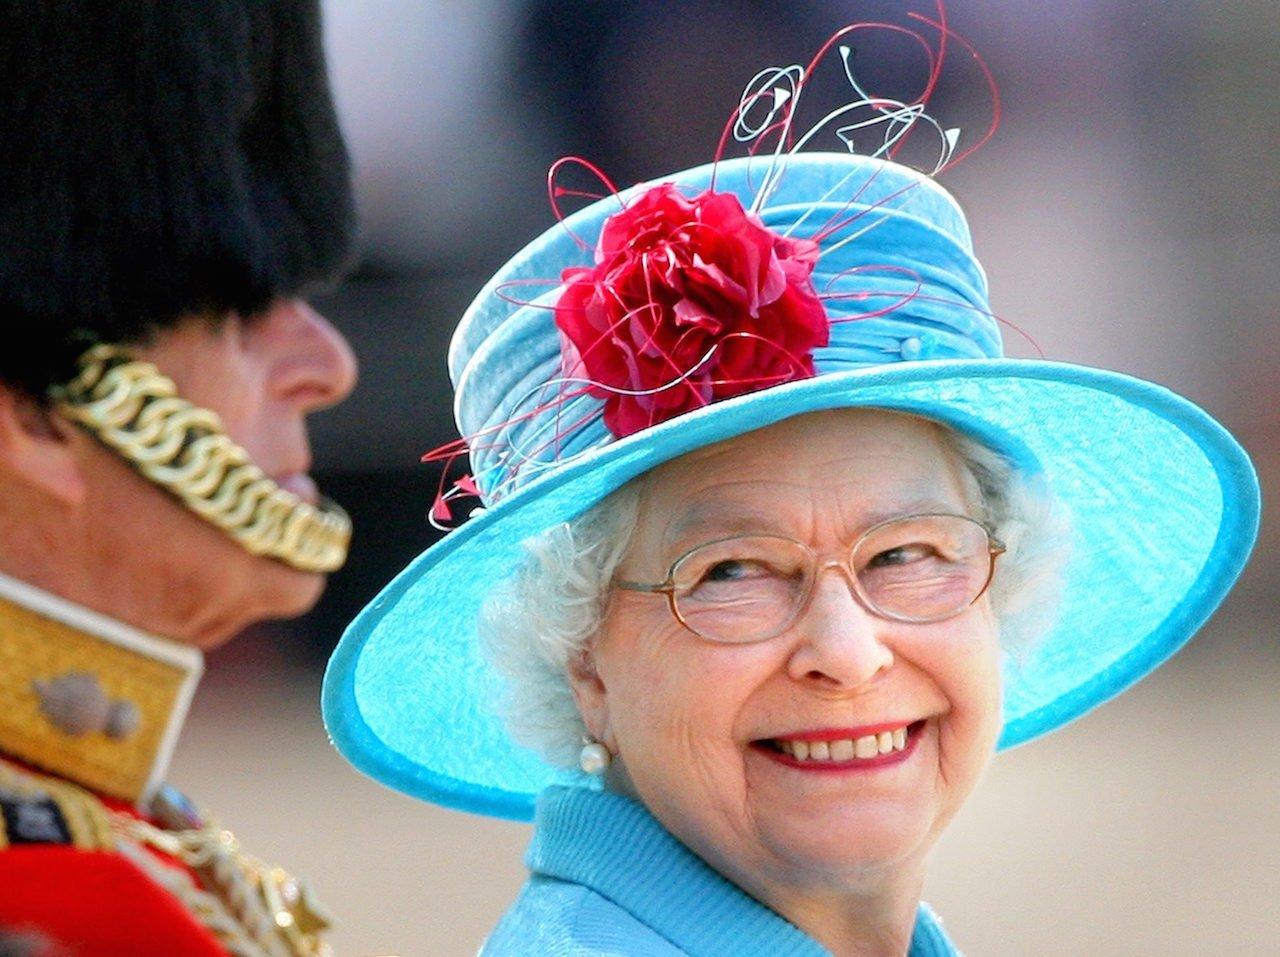 Queen Elizabeth Ii 5 Ways She 39 S Making The Most Of Her